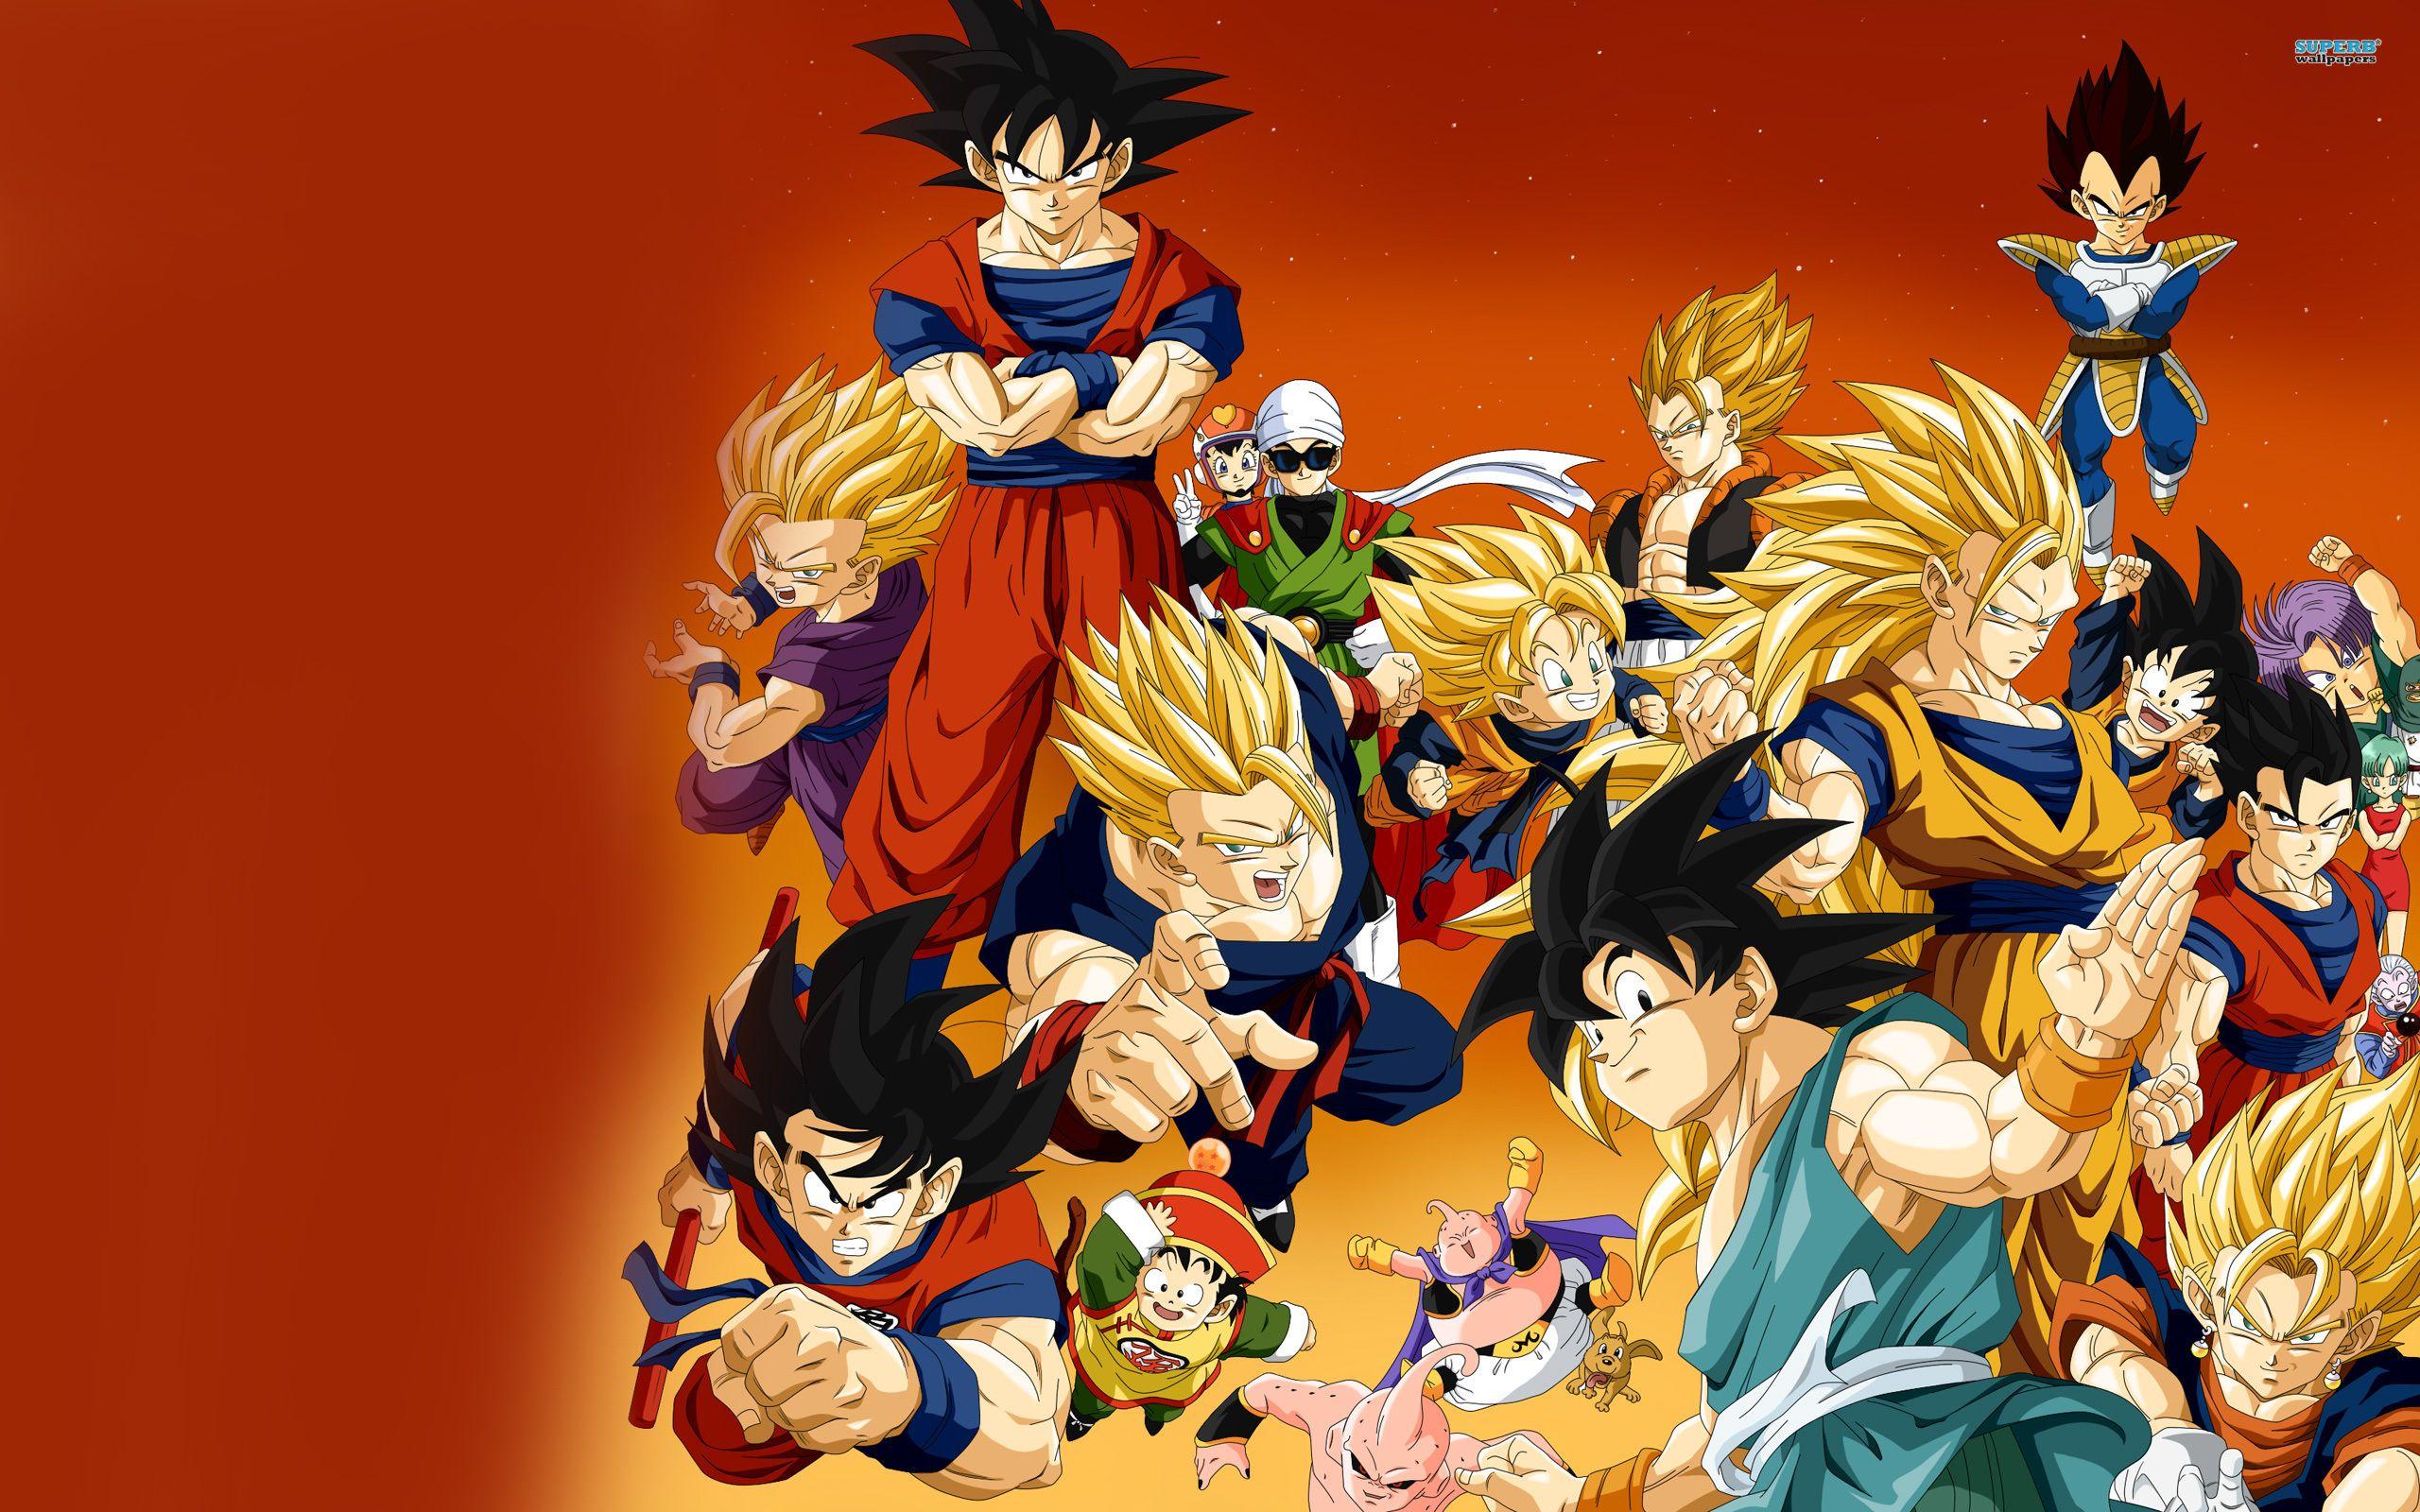 Dragon Ball Z Wallpapers Hd Goku Free Download Dragon Ball